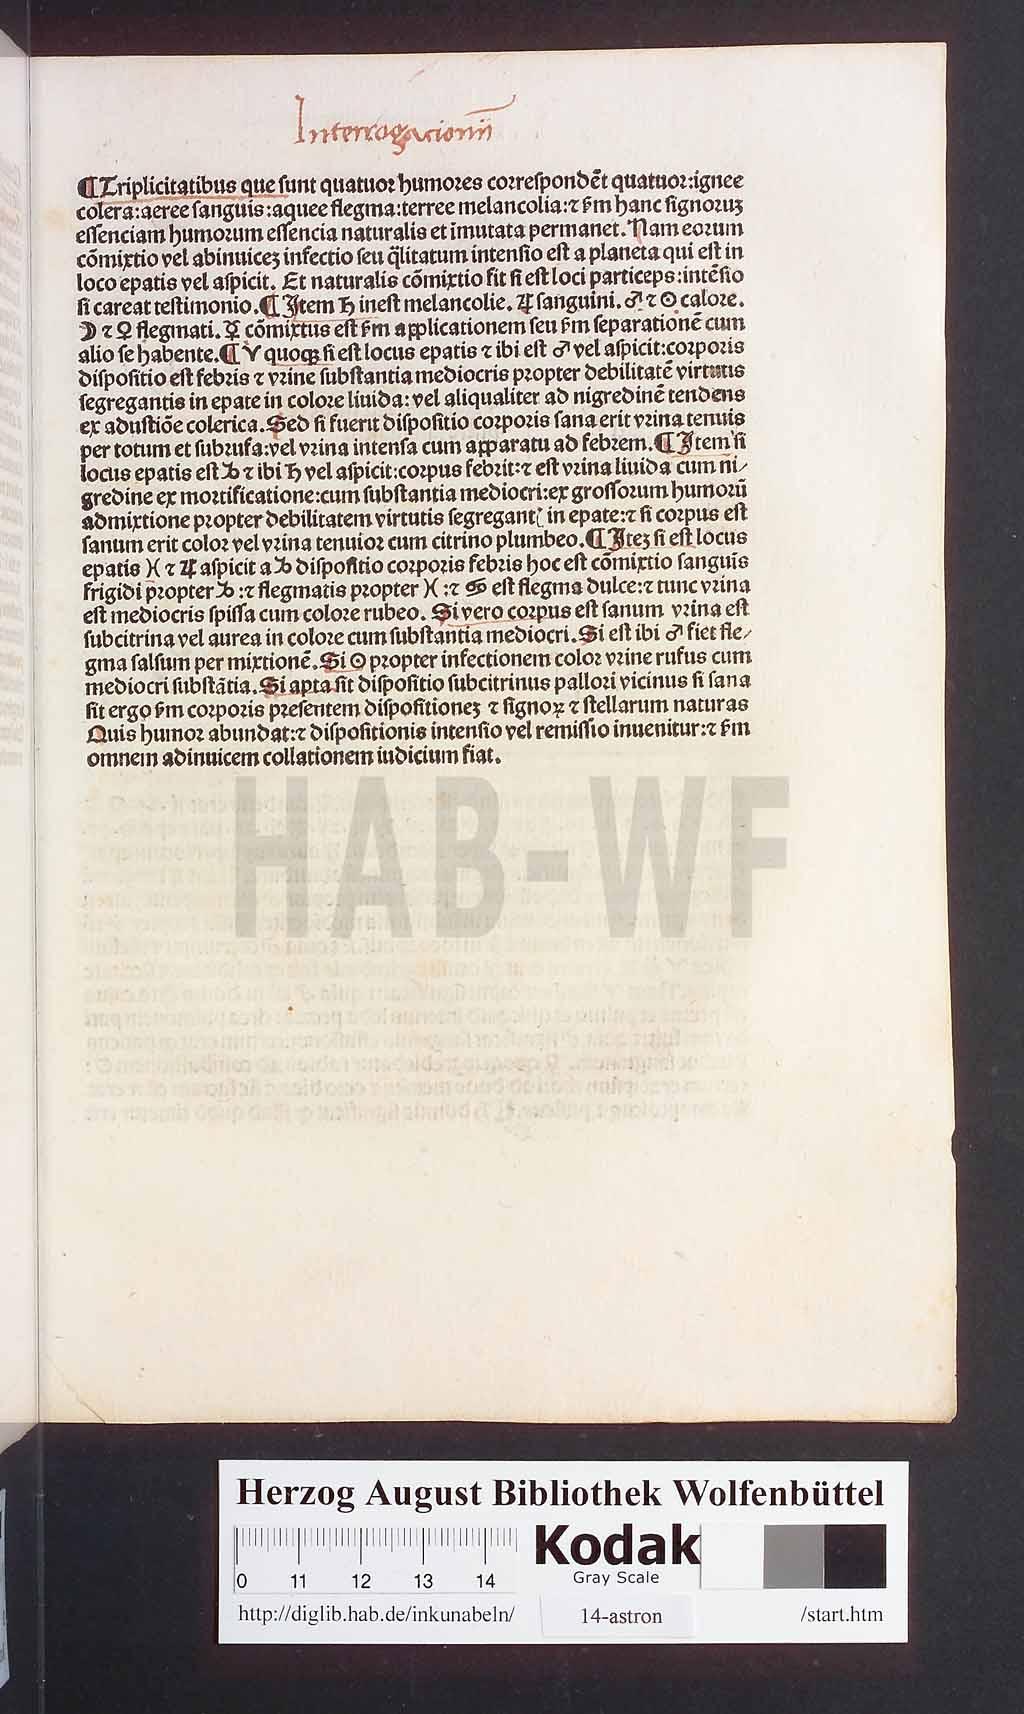 http://diglib.hab.de/inkunabeln/14-astron/00177.jpg